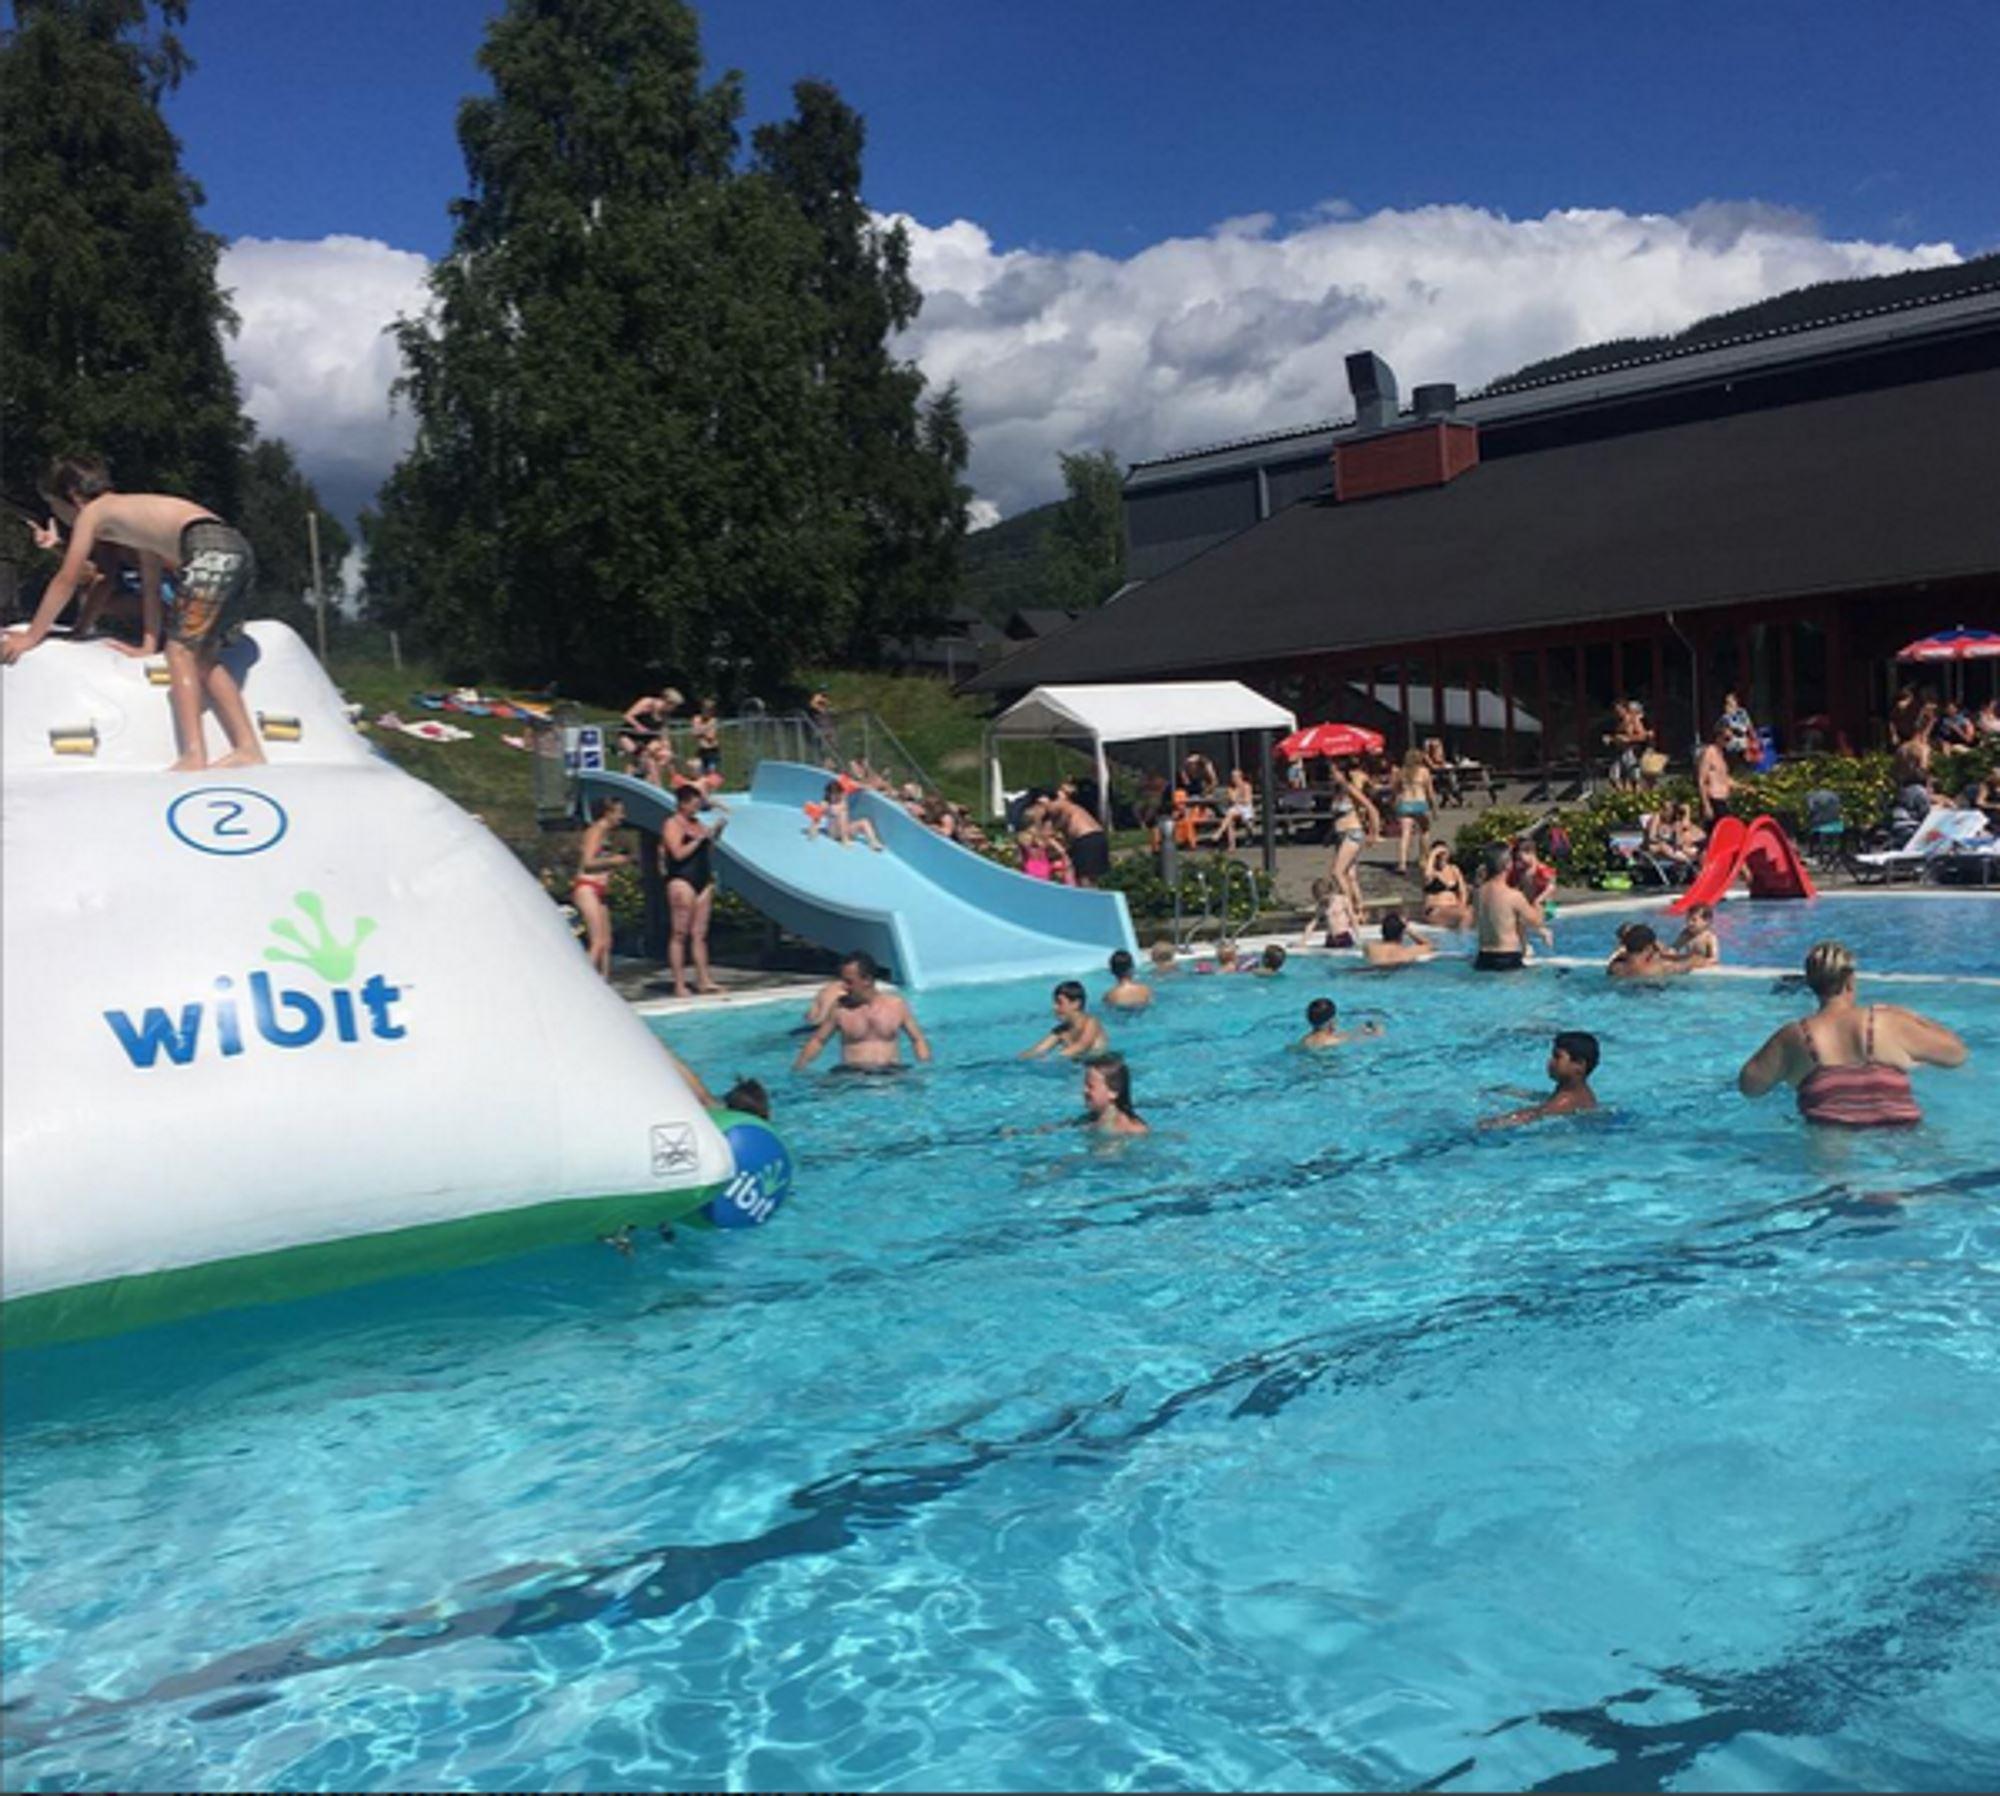 Jorekstad water park in Lillehammer region